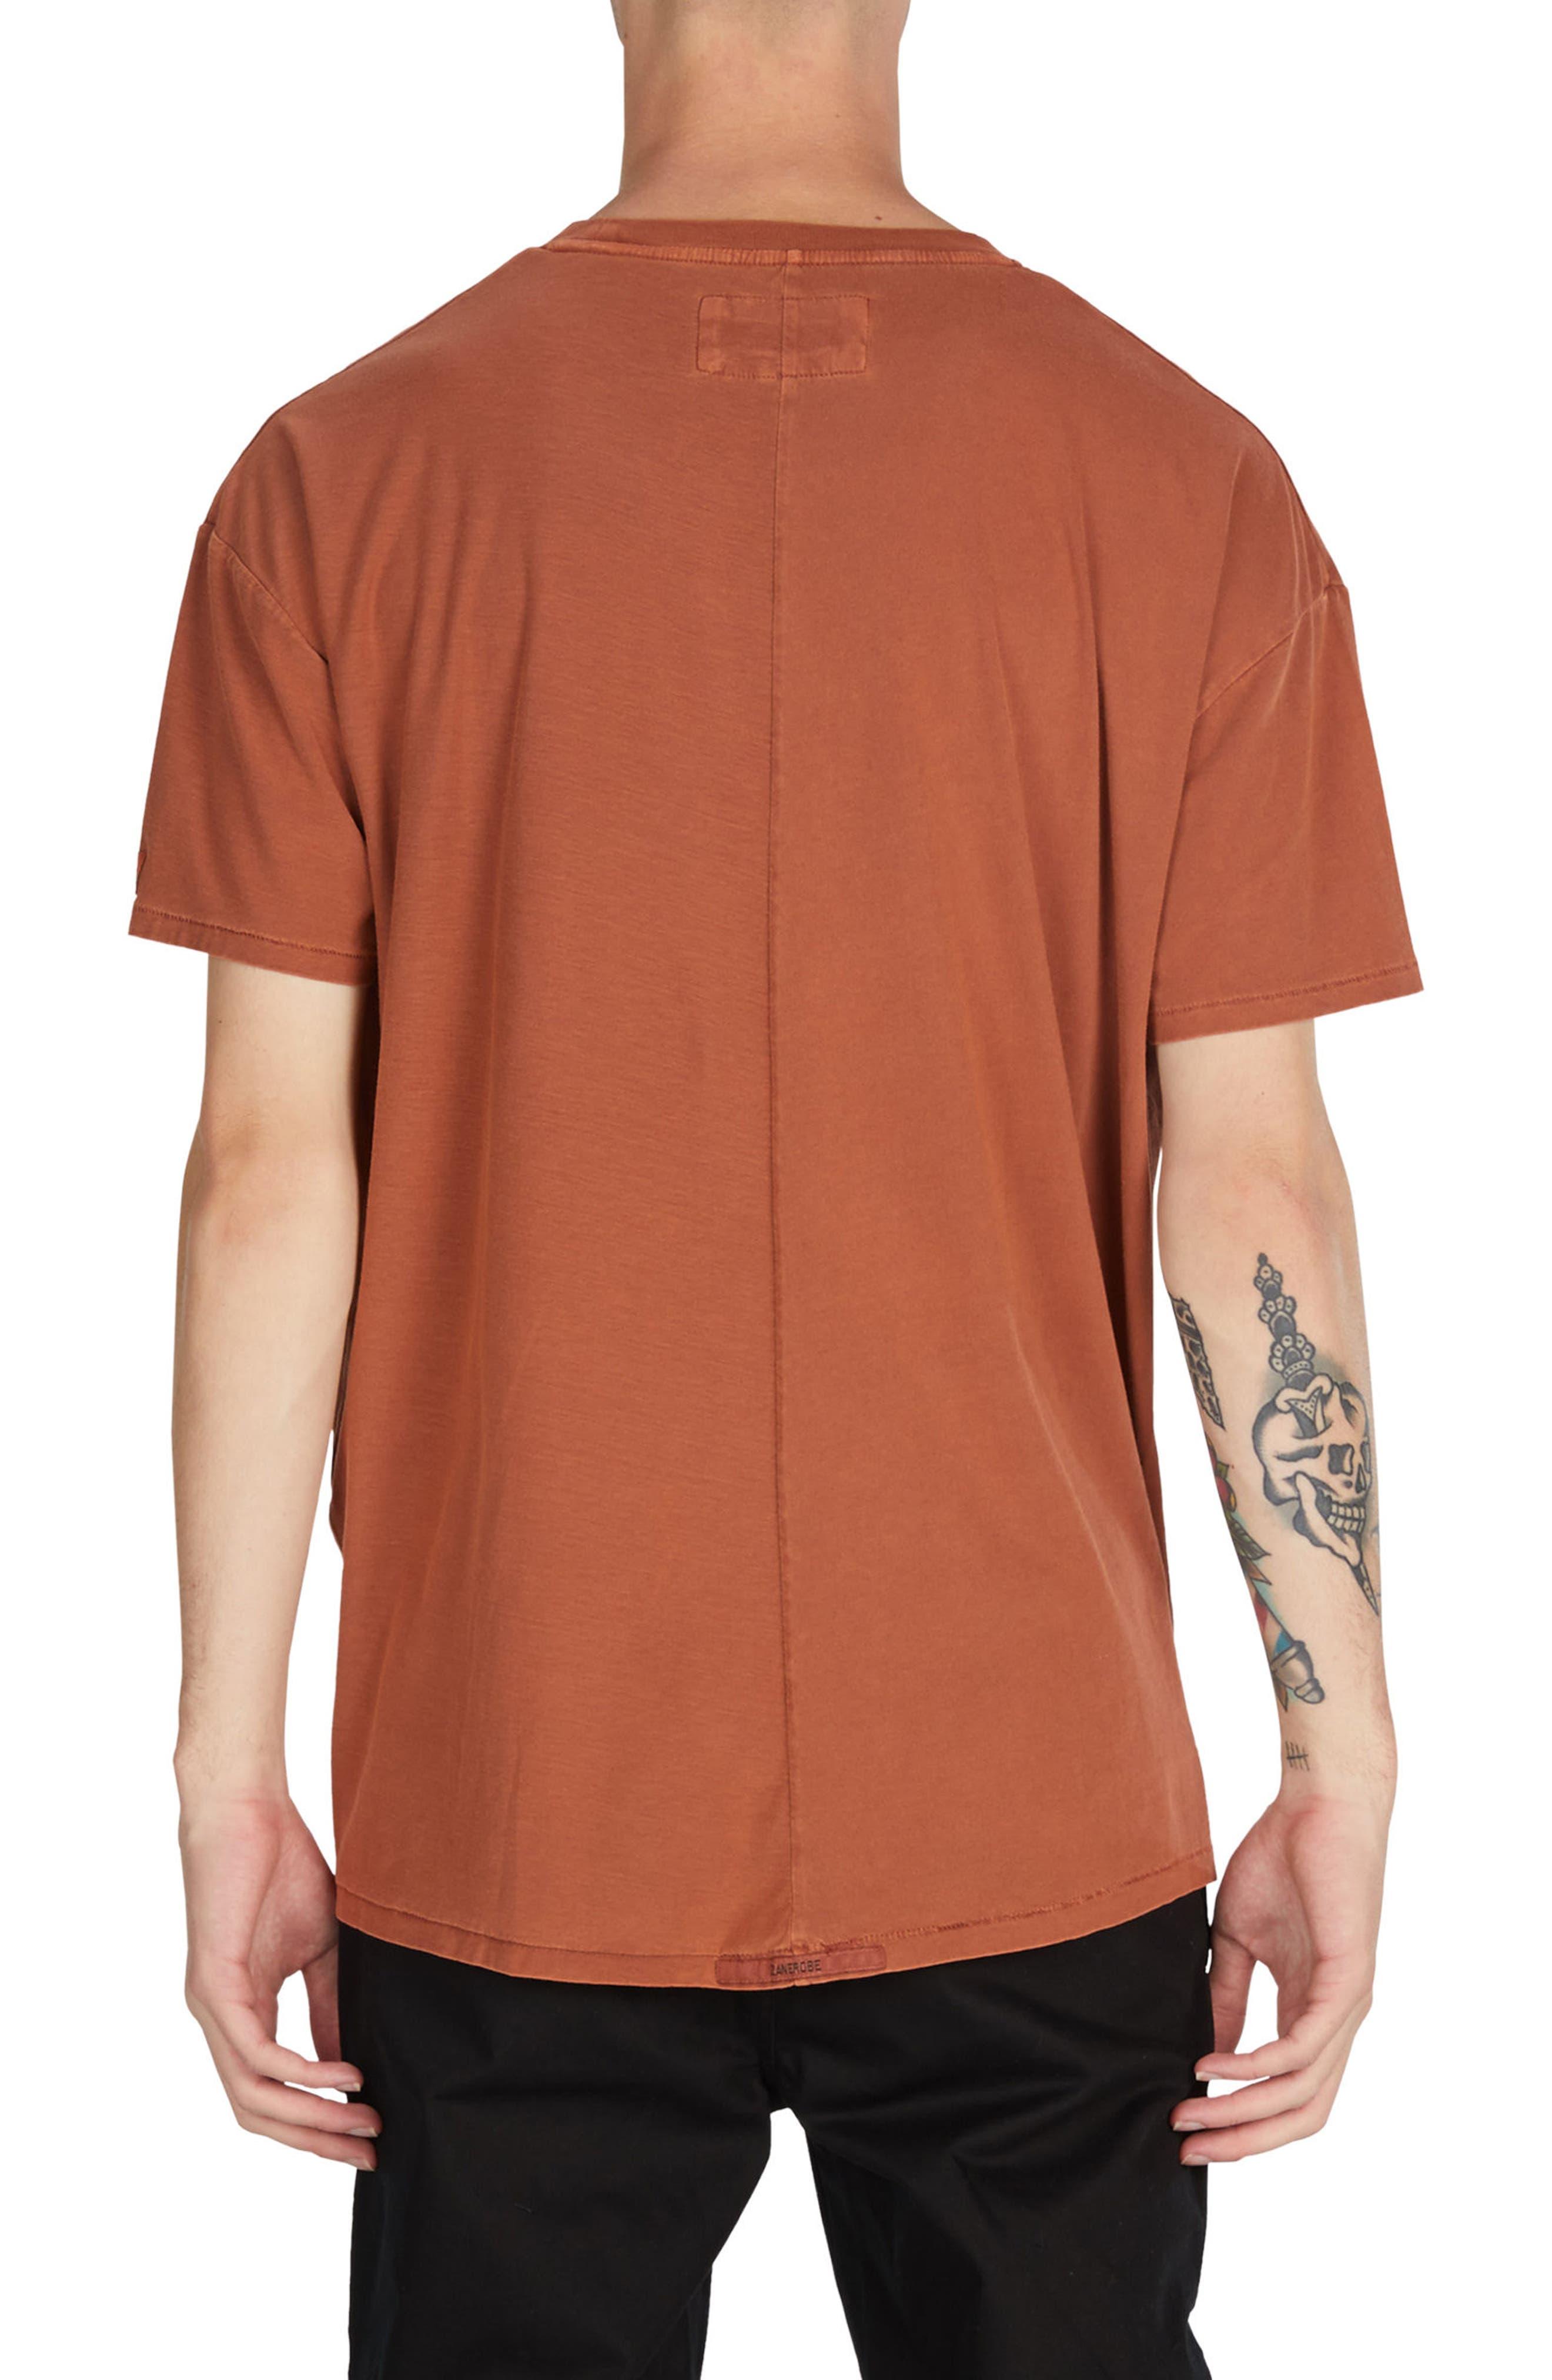 Rugger T-Shirt,                             Alternate thumbnail 2, color,                             800